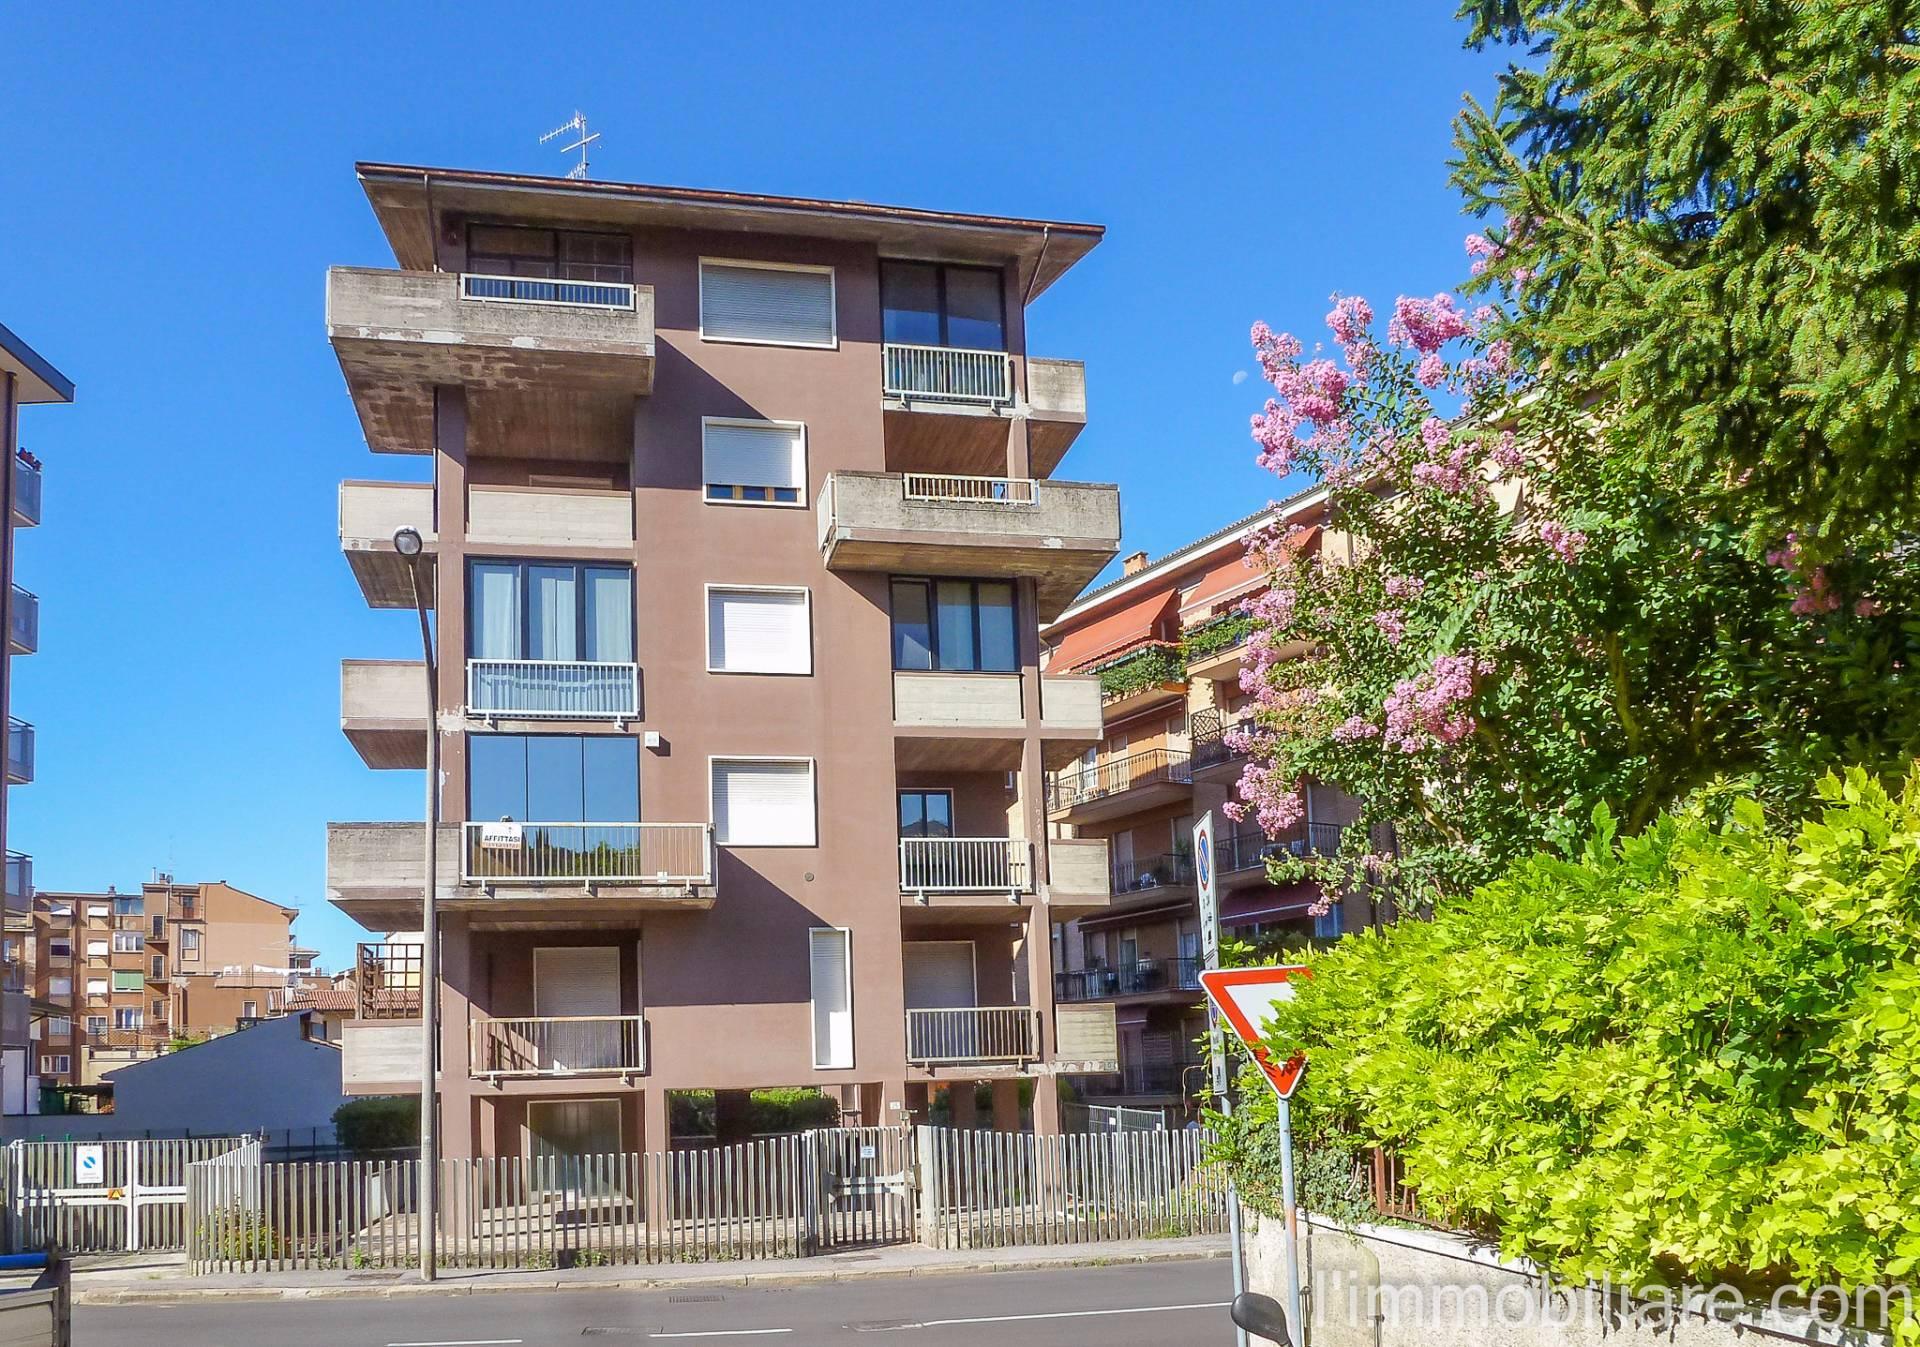 Bilocale Verona Via Santini 2